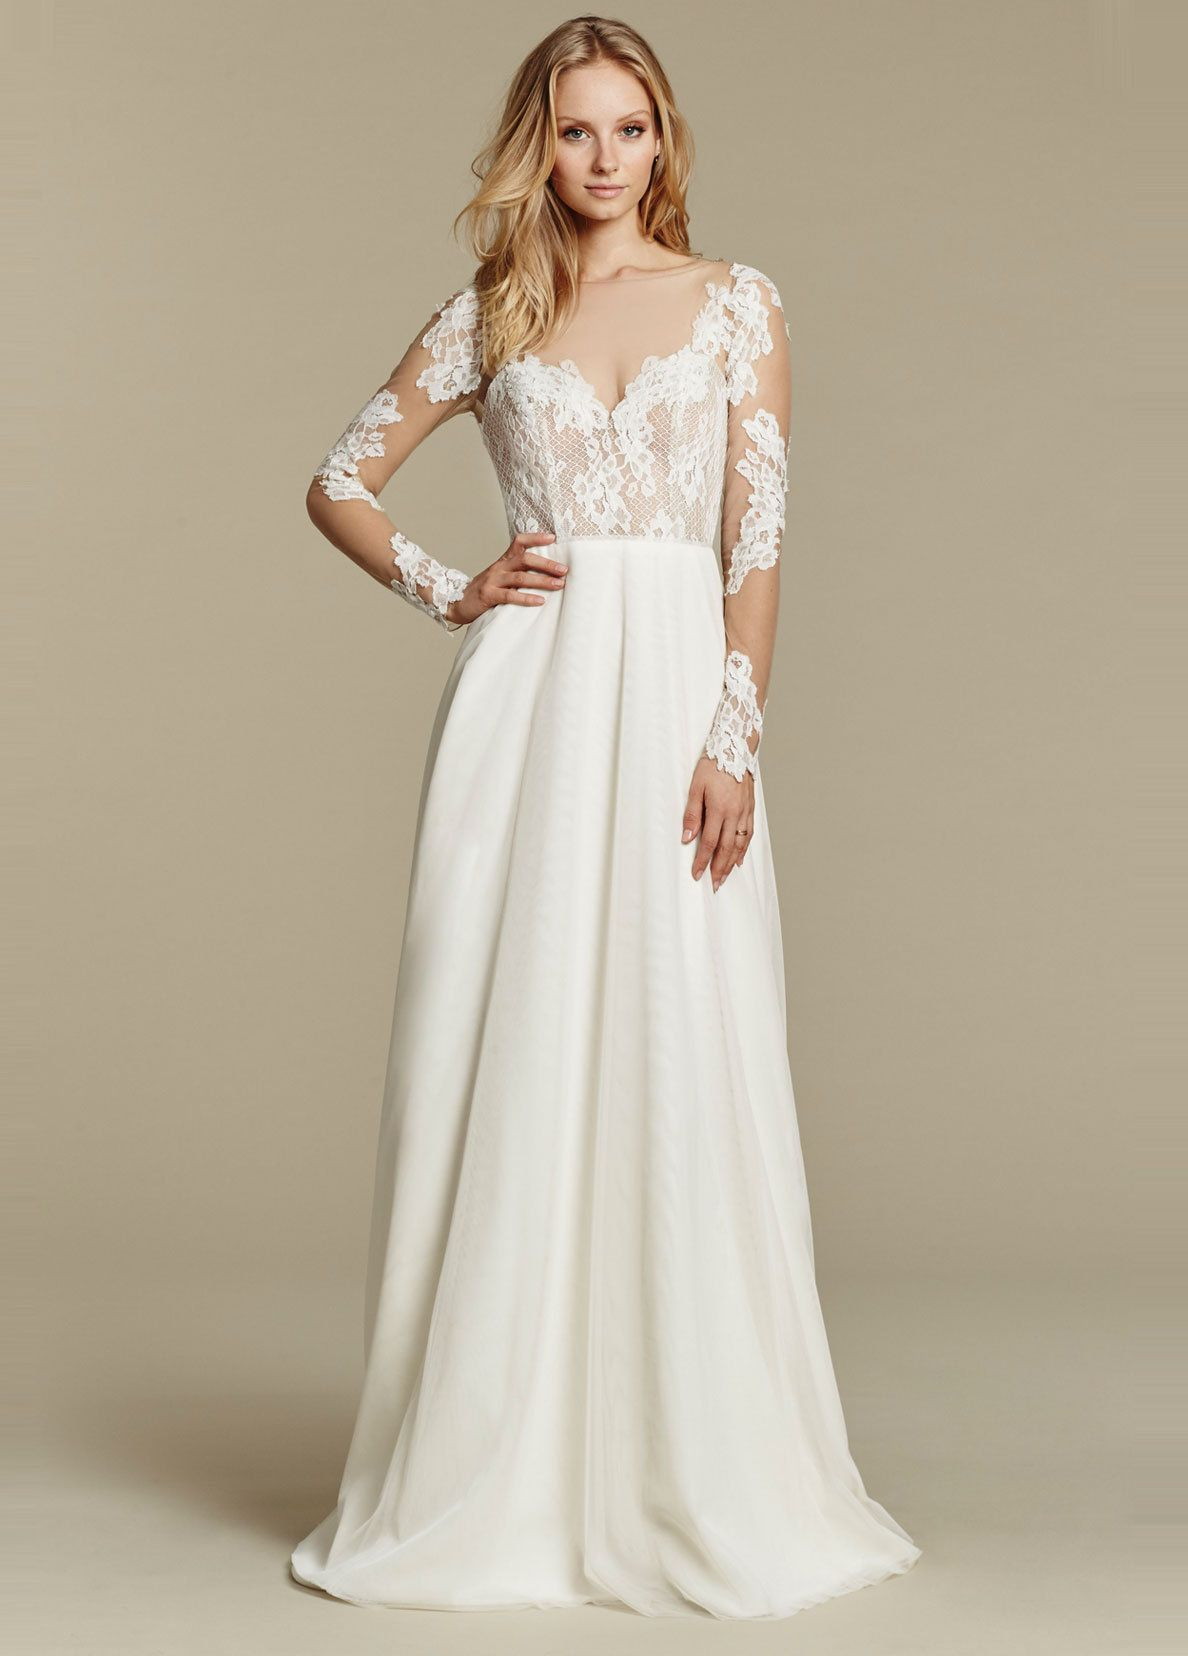 Simple Blush Wedding Dresses - Best Shapewear for Wedding Dress ...